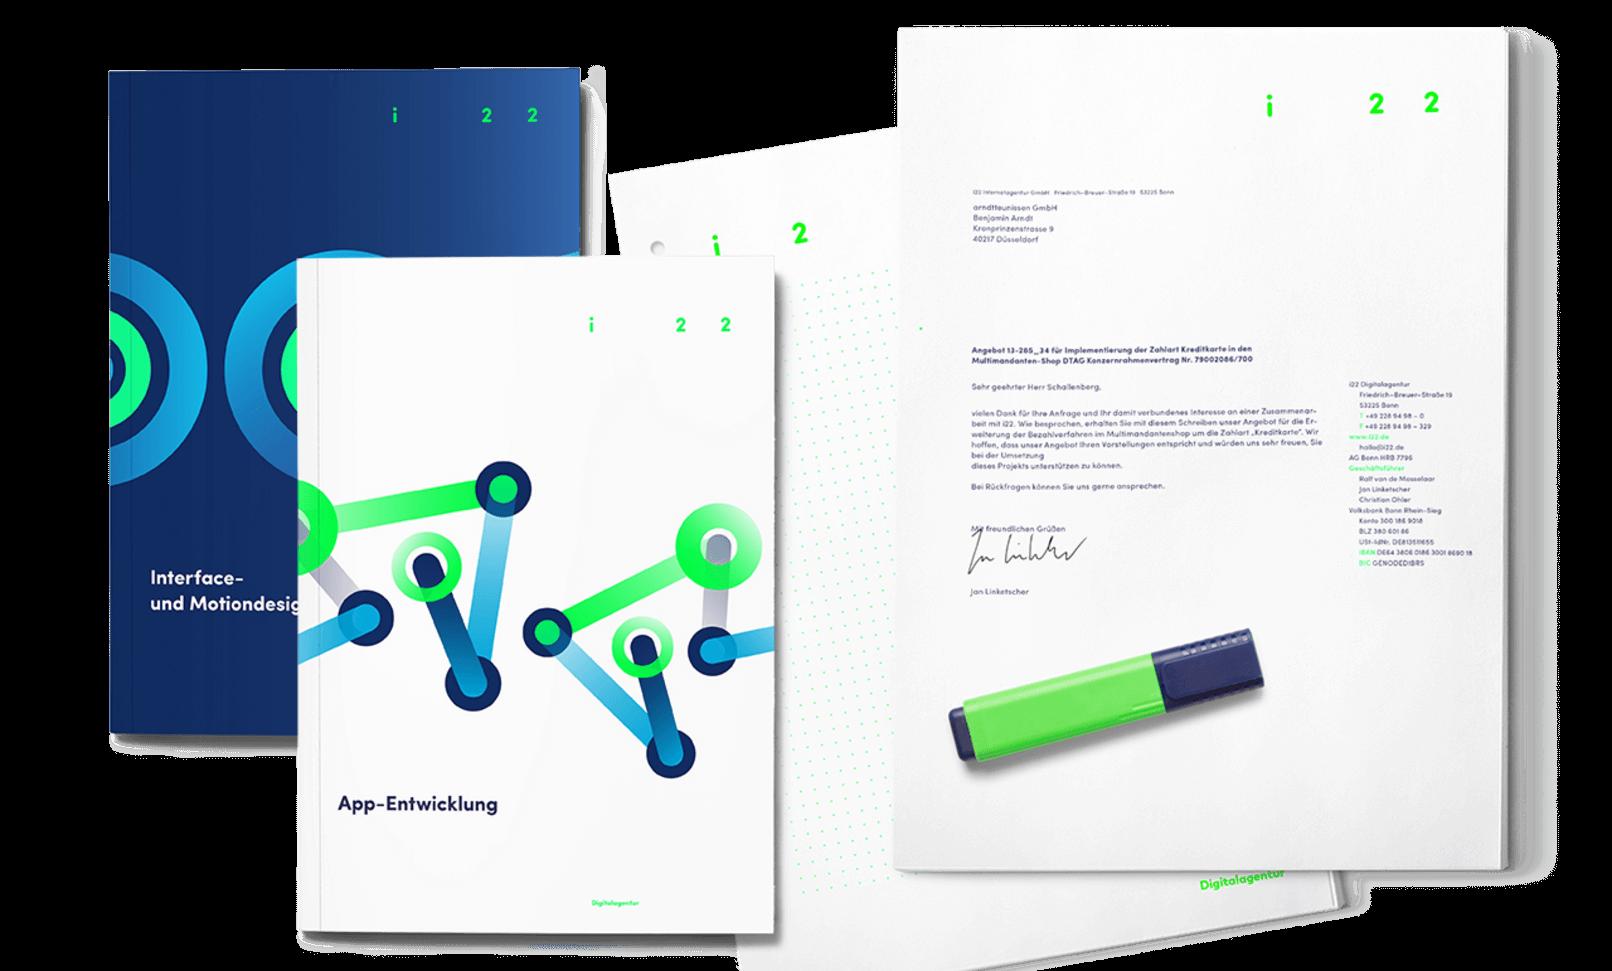 Corporate Design Entwickeln | Corporate Design Fur Kolner It Spezialisten Cologne Intelligence